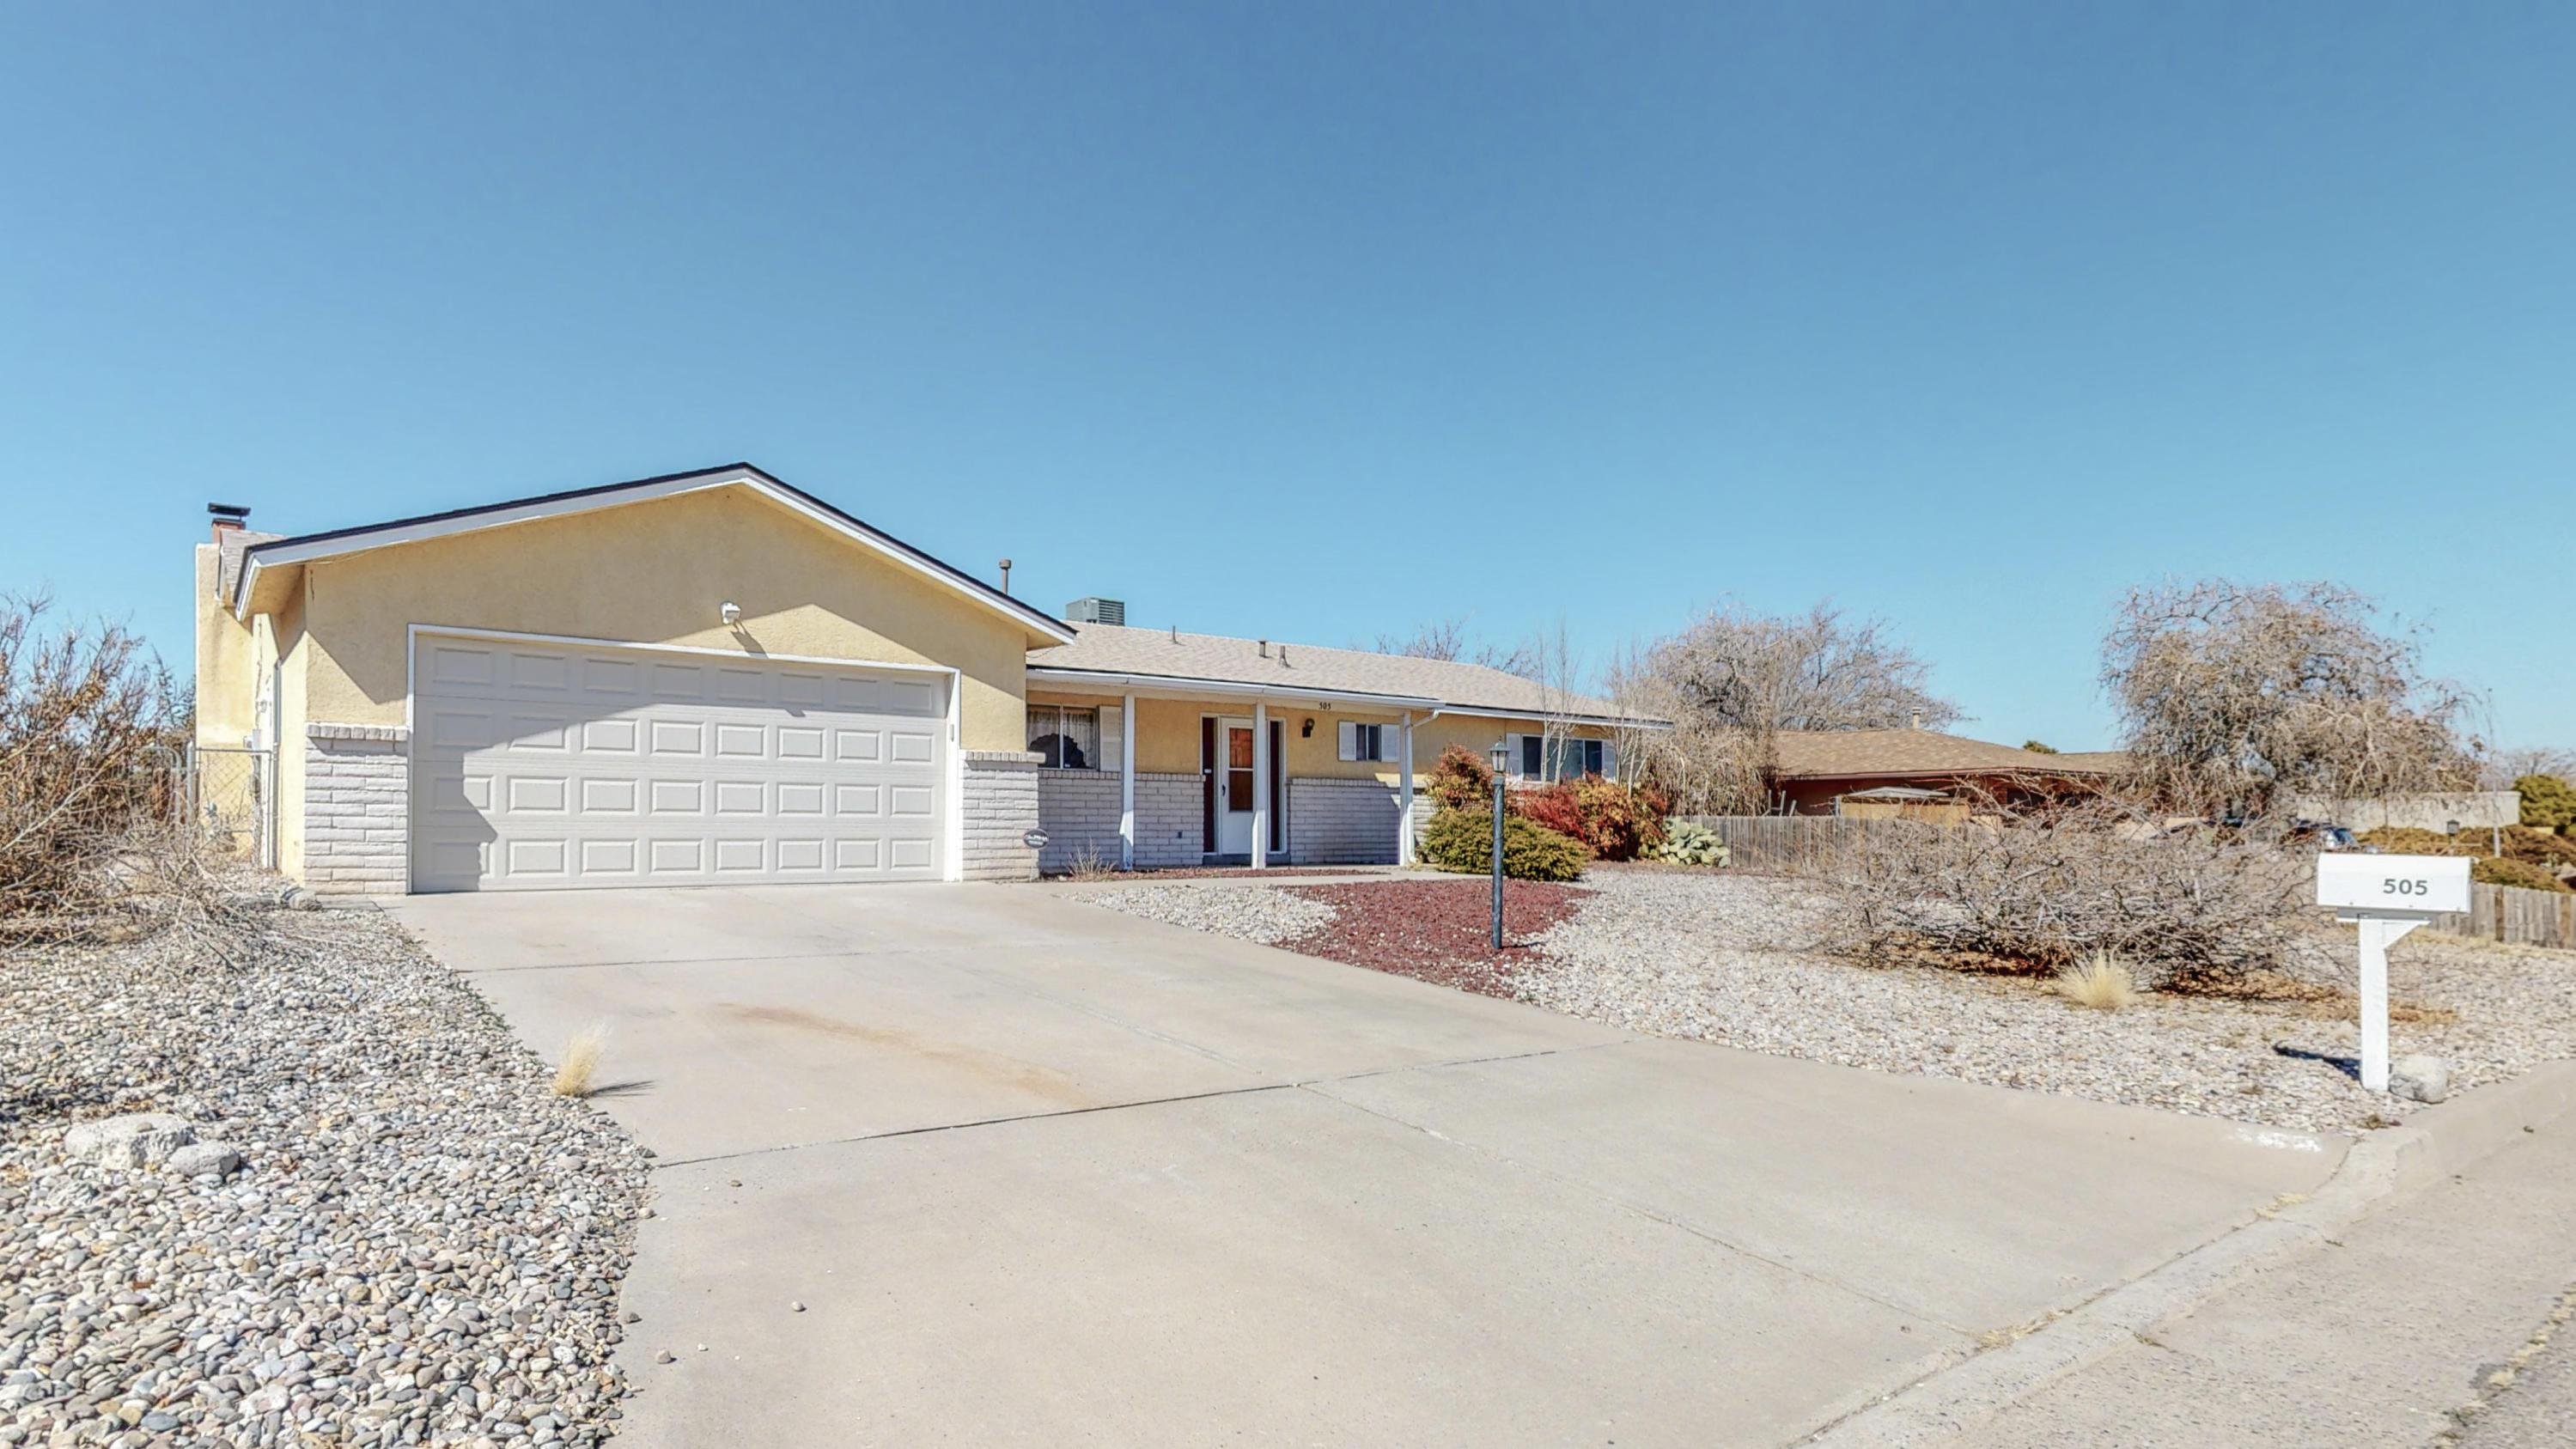 505 SAN JUAN DE RIO Drive SE Property Photo - Rio Rancho, NM real estate listing